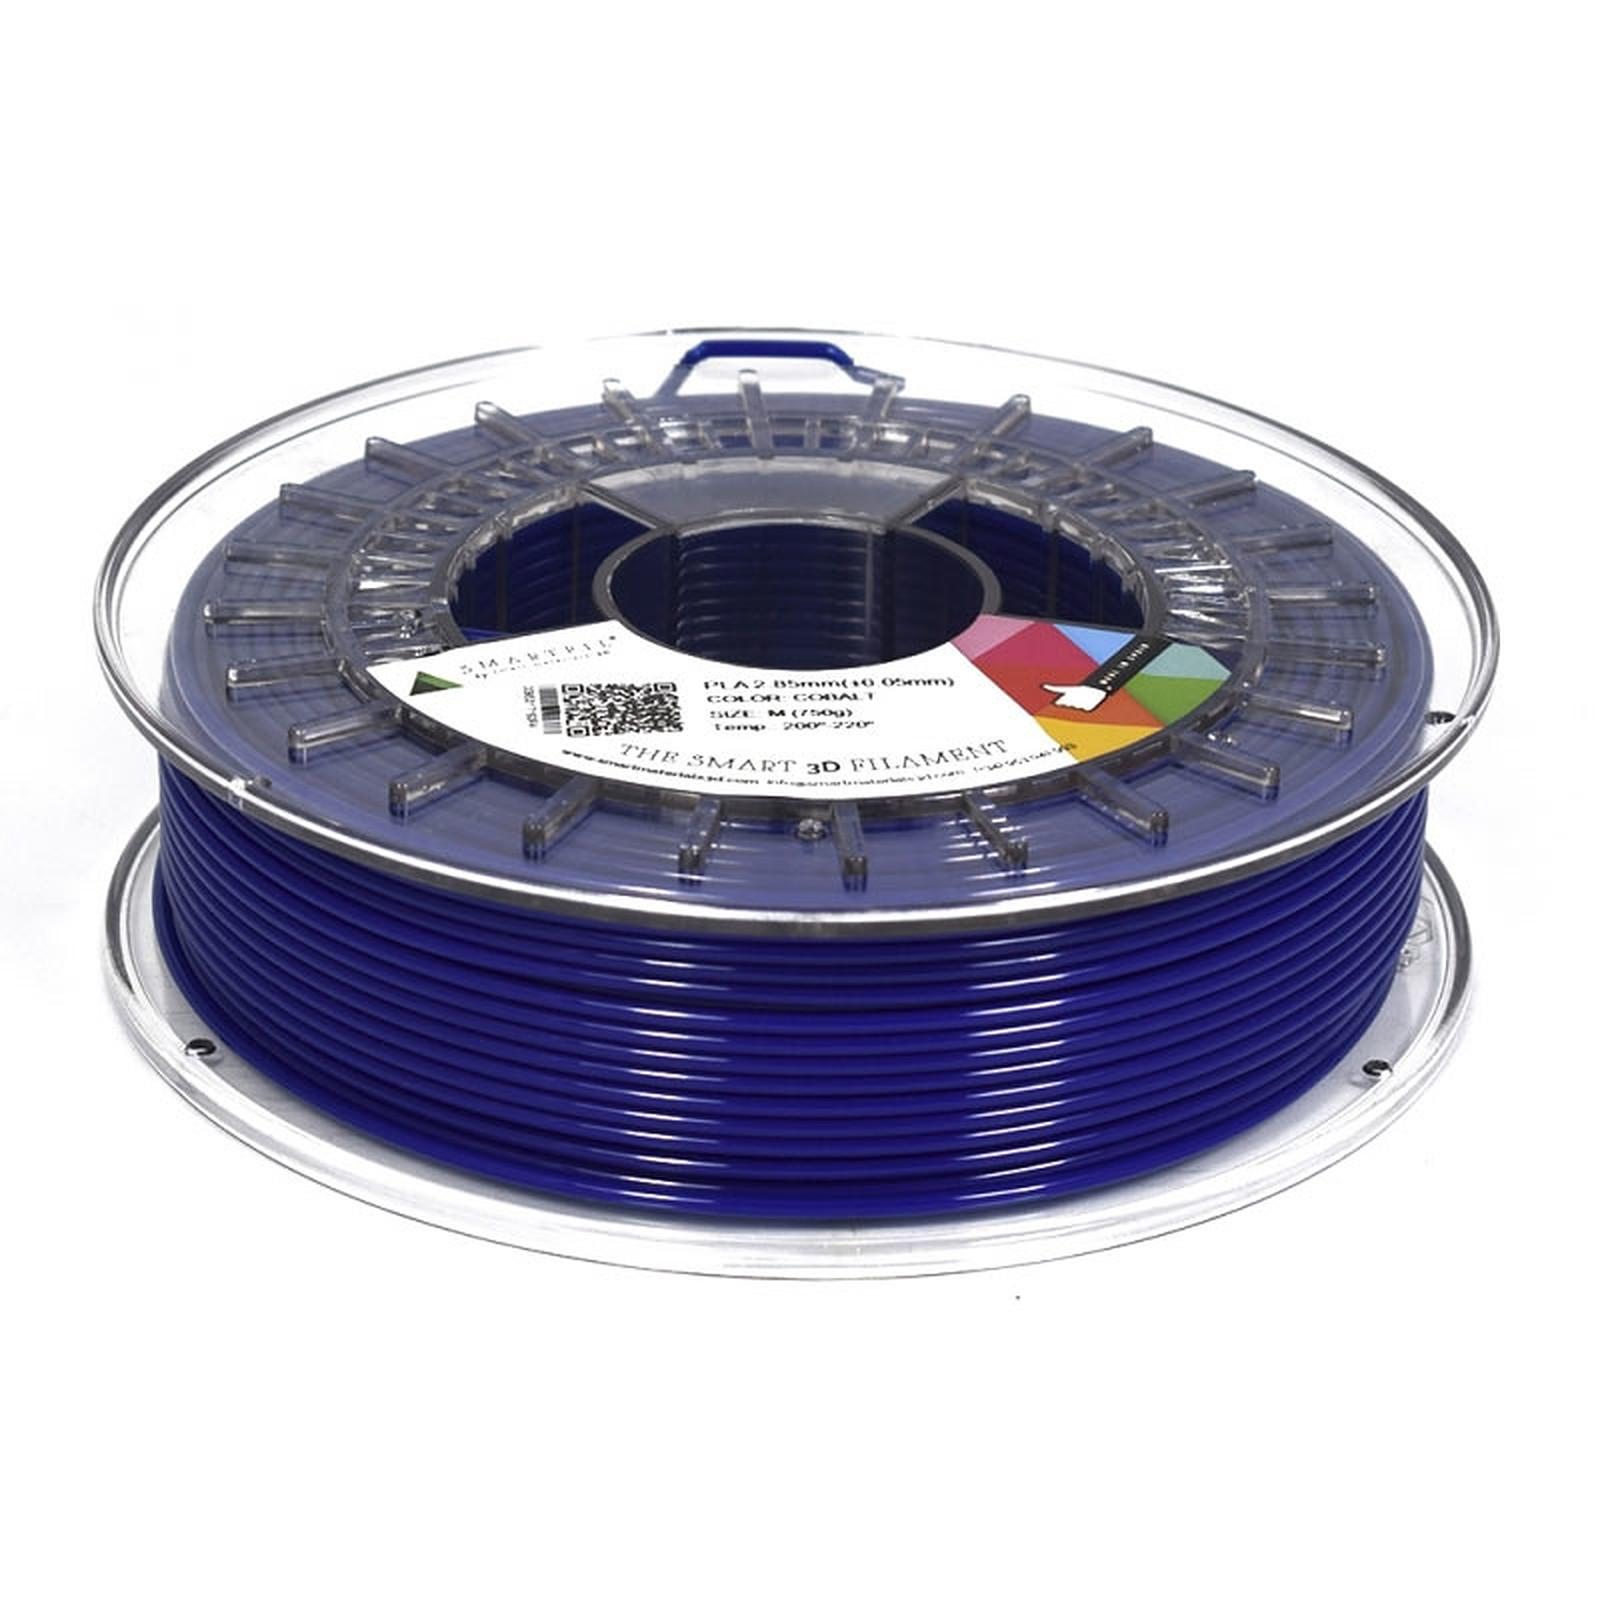 Smartfil Bobine PLA 2.85mm 750g - Bleu